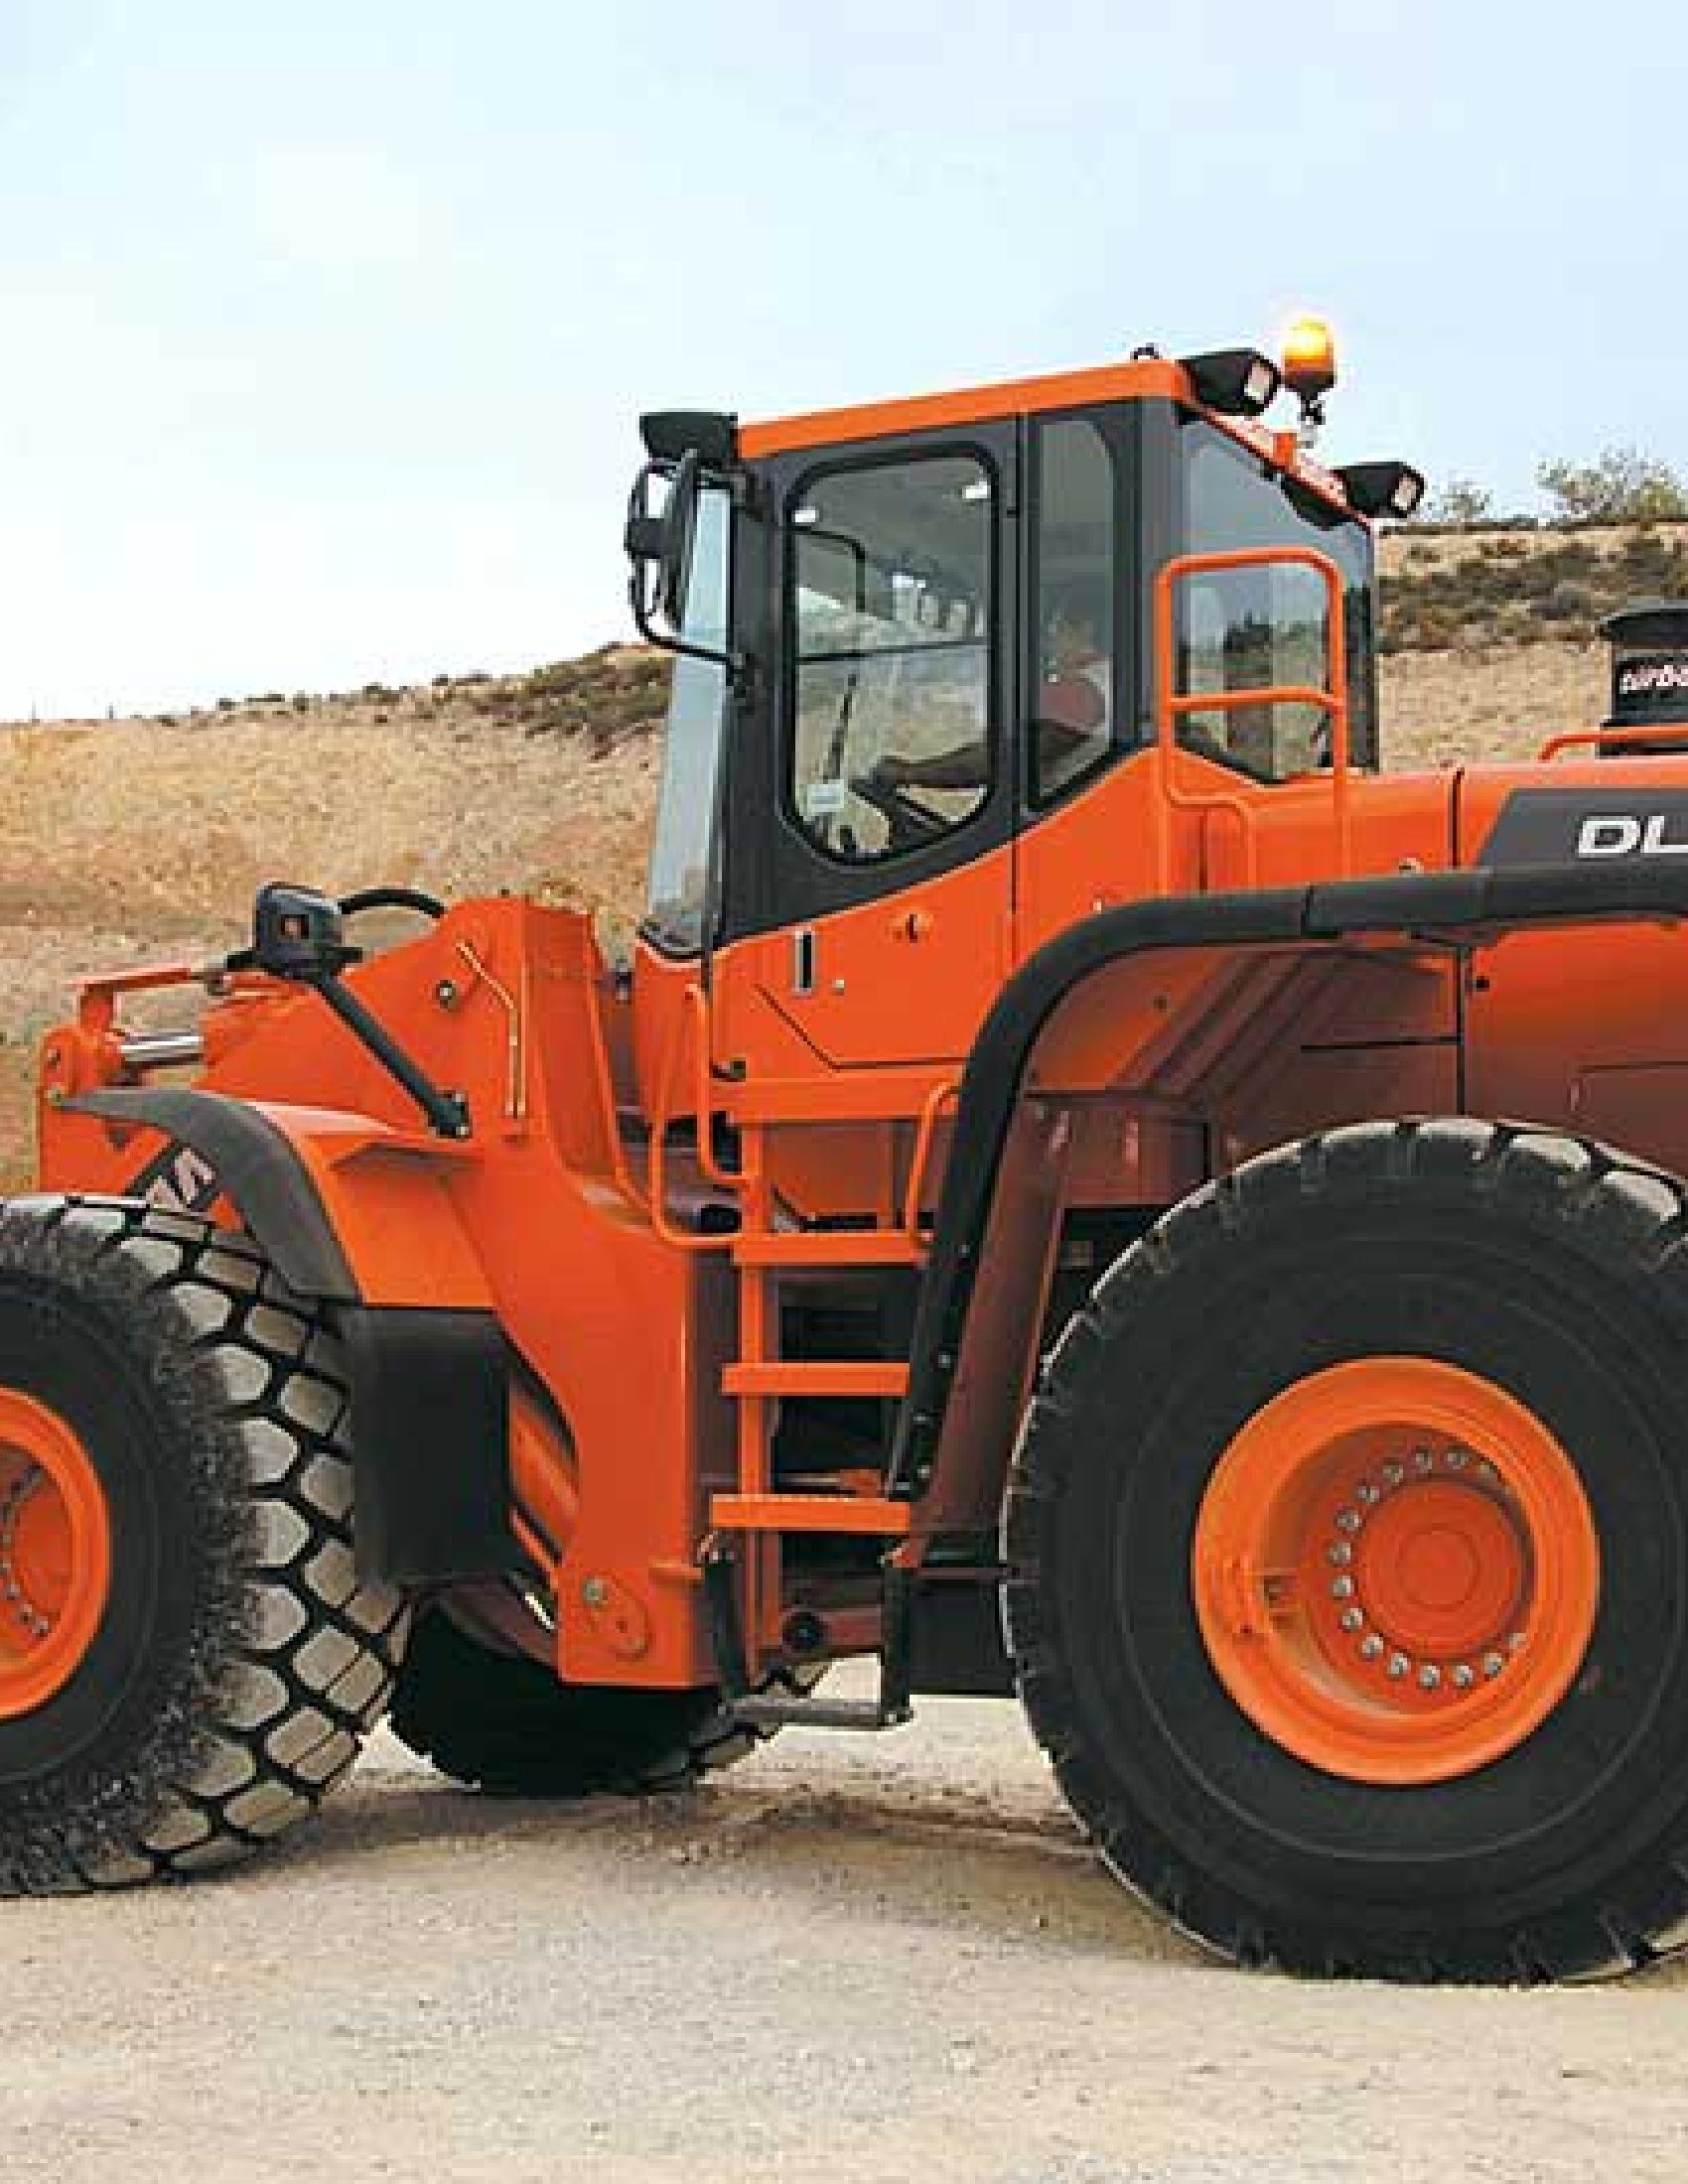 Doosan DL420 Wheel Loader manual